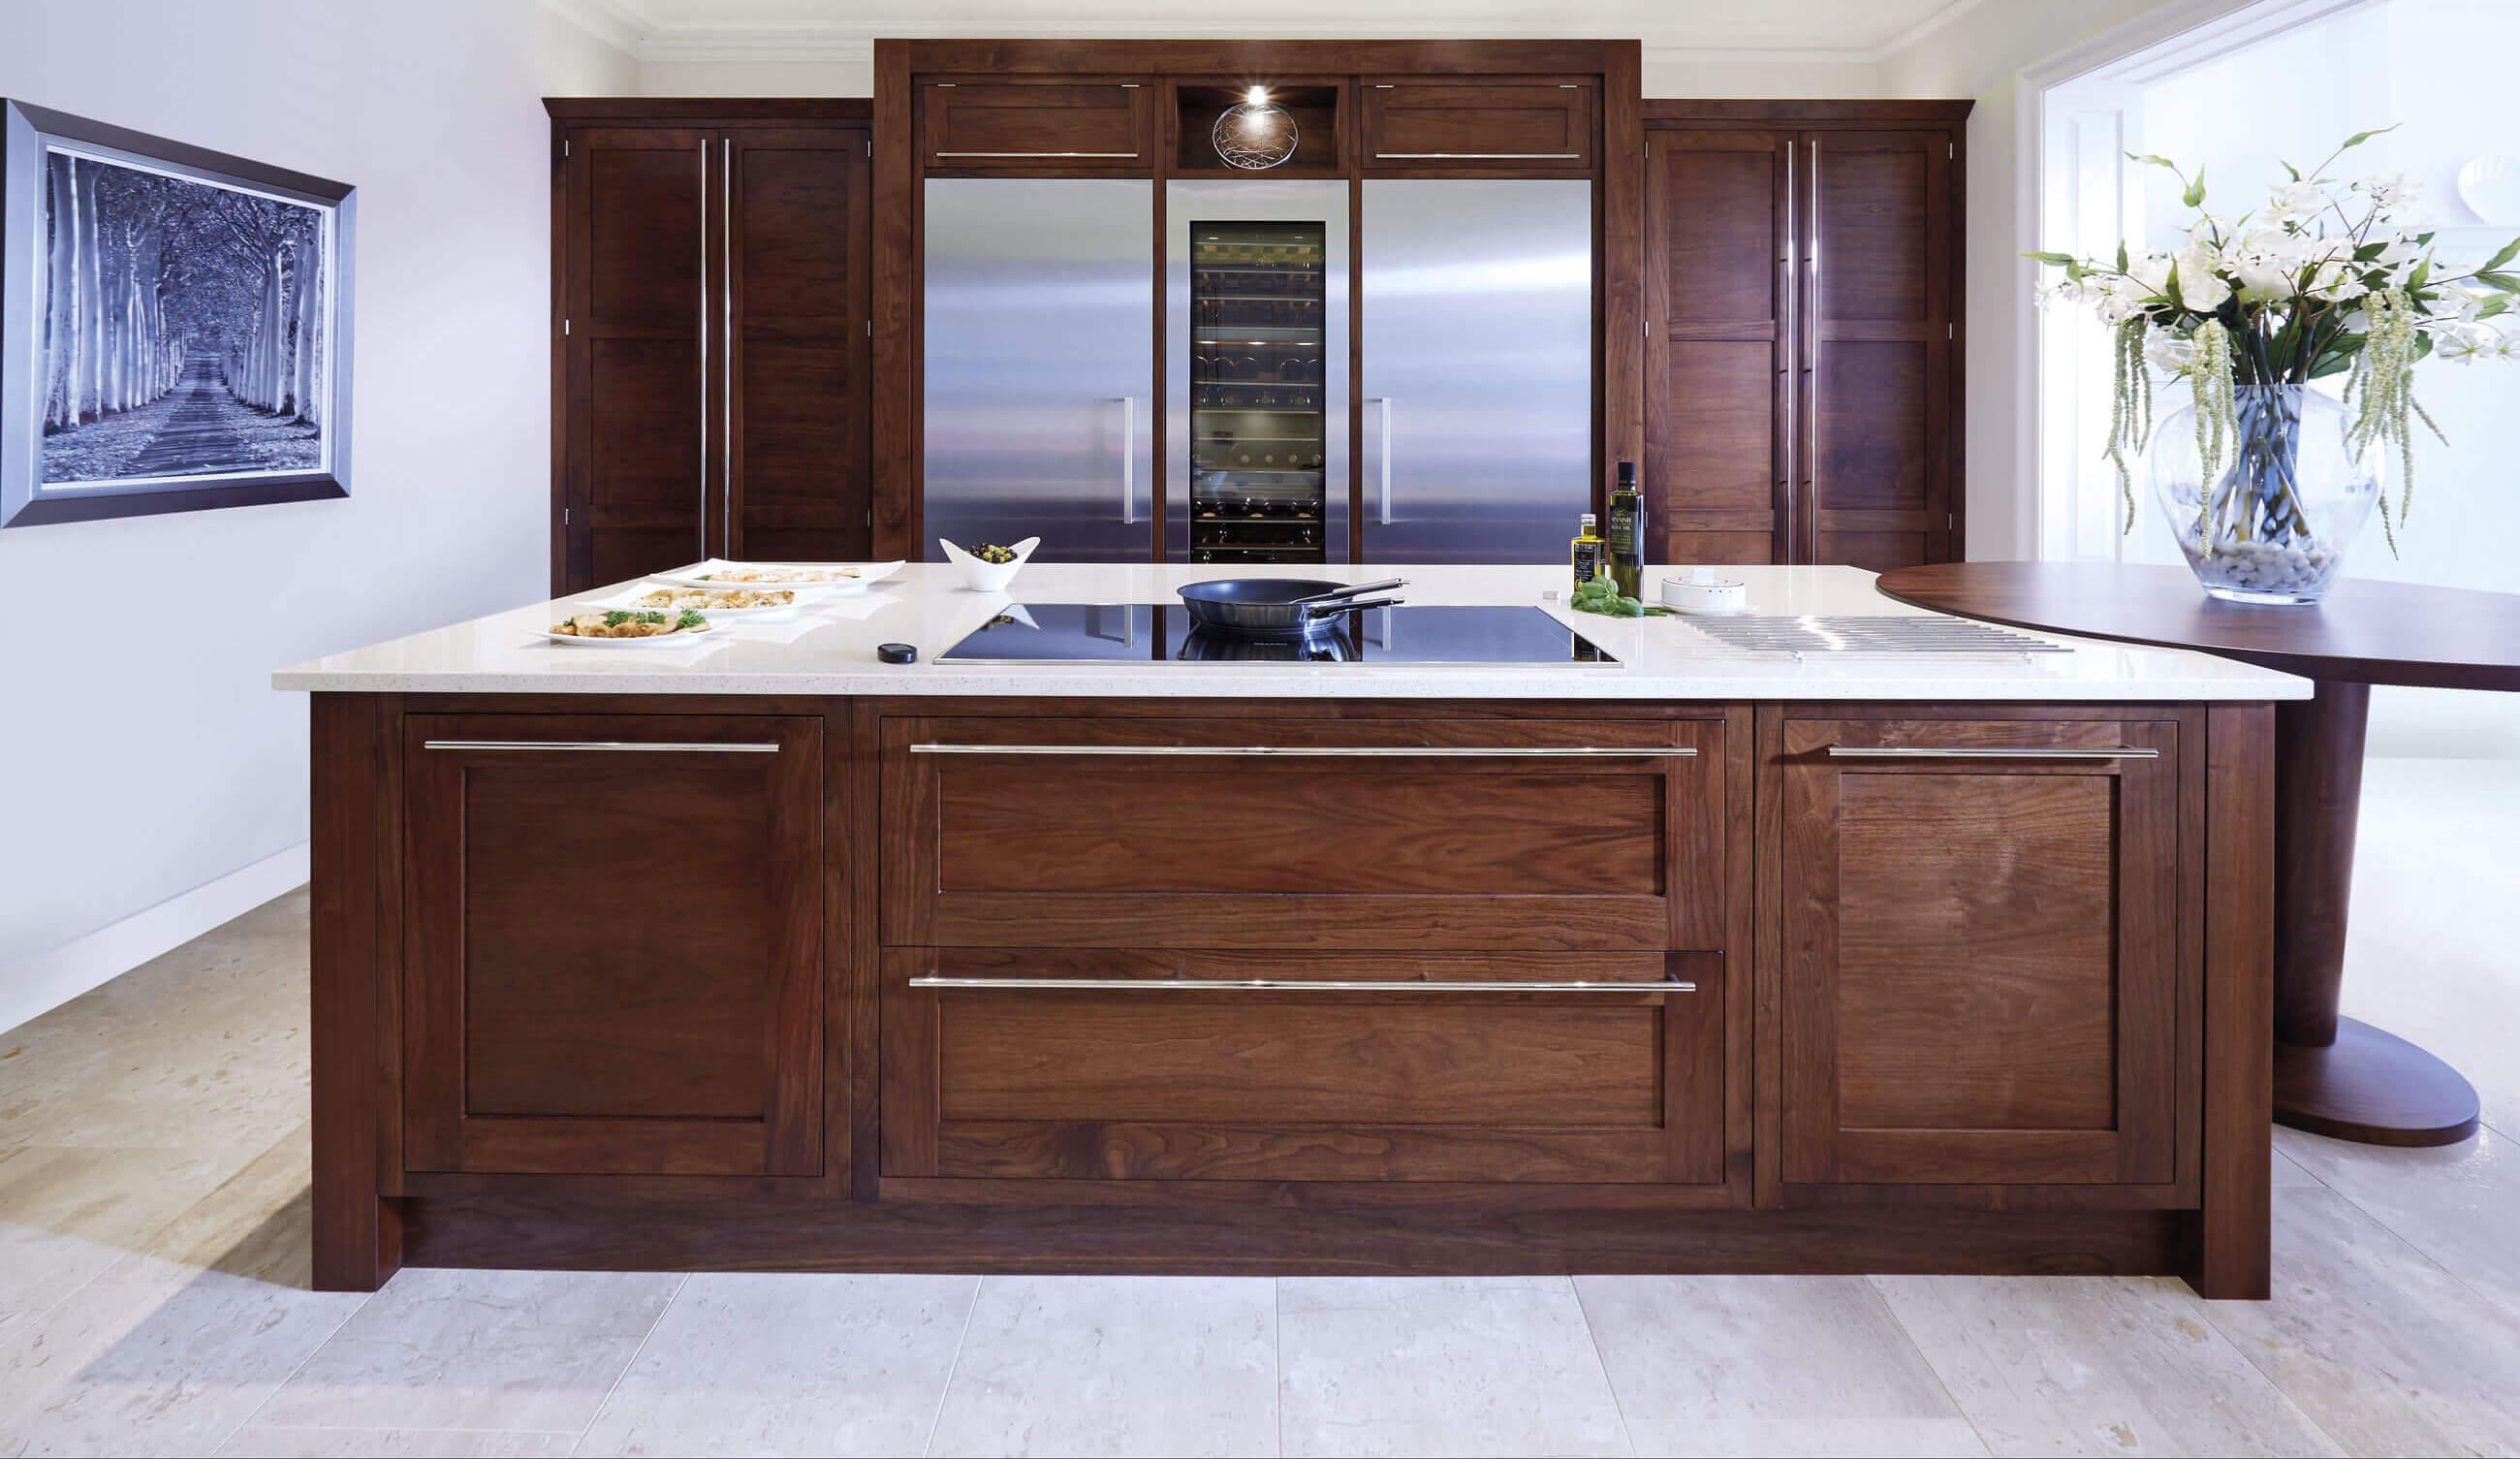 finest selection 20b0f 06c40 Walnut Kitchen | Tom Howley